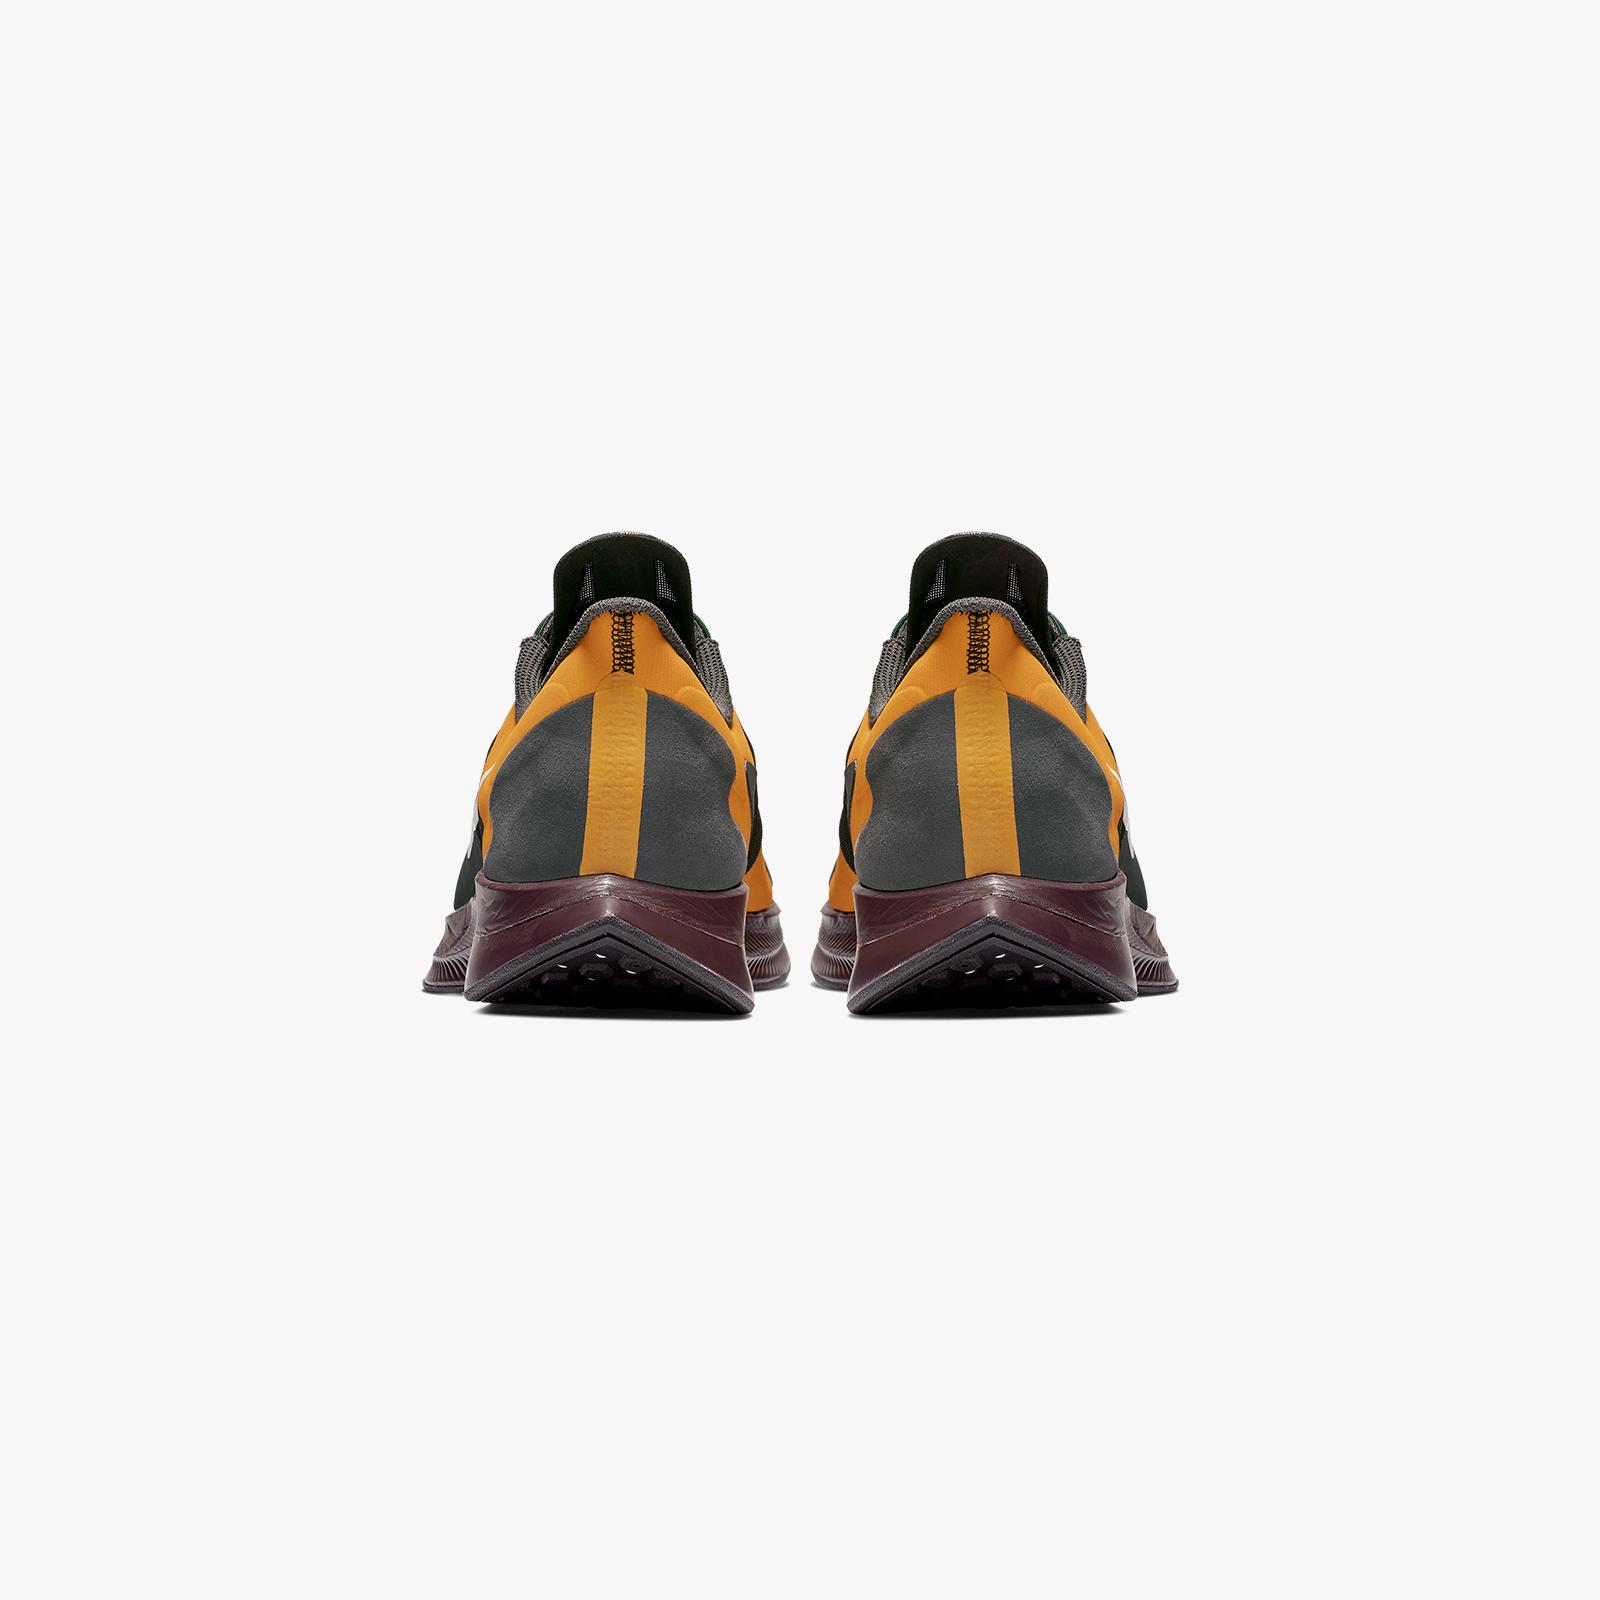 fbad5ff5fb342 Nike Zoom Pegasus 35 Turbo x Gyakusou - Bq0579-700 - Sneakersnstuff ...